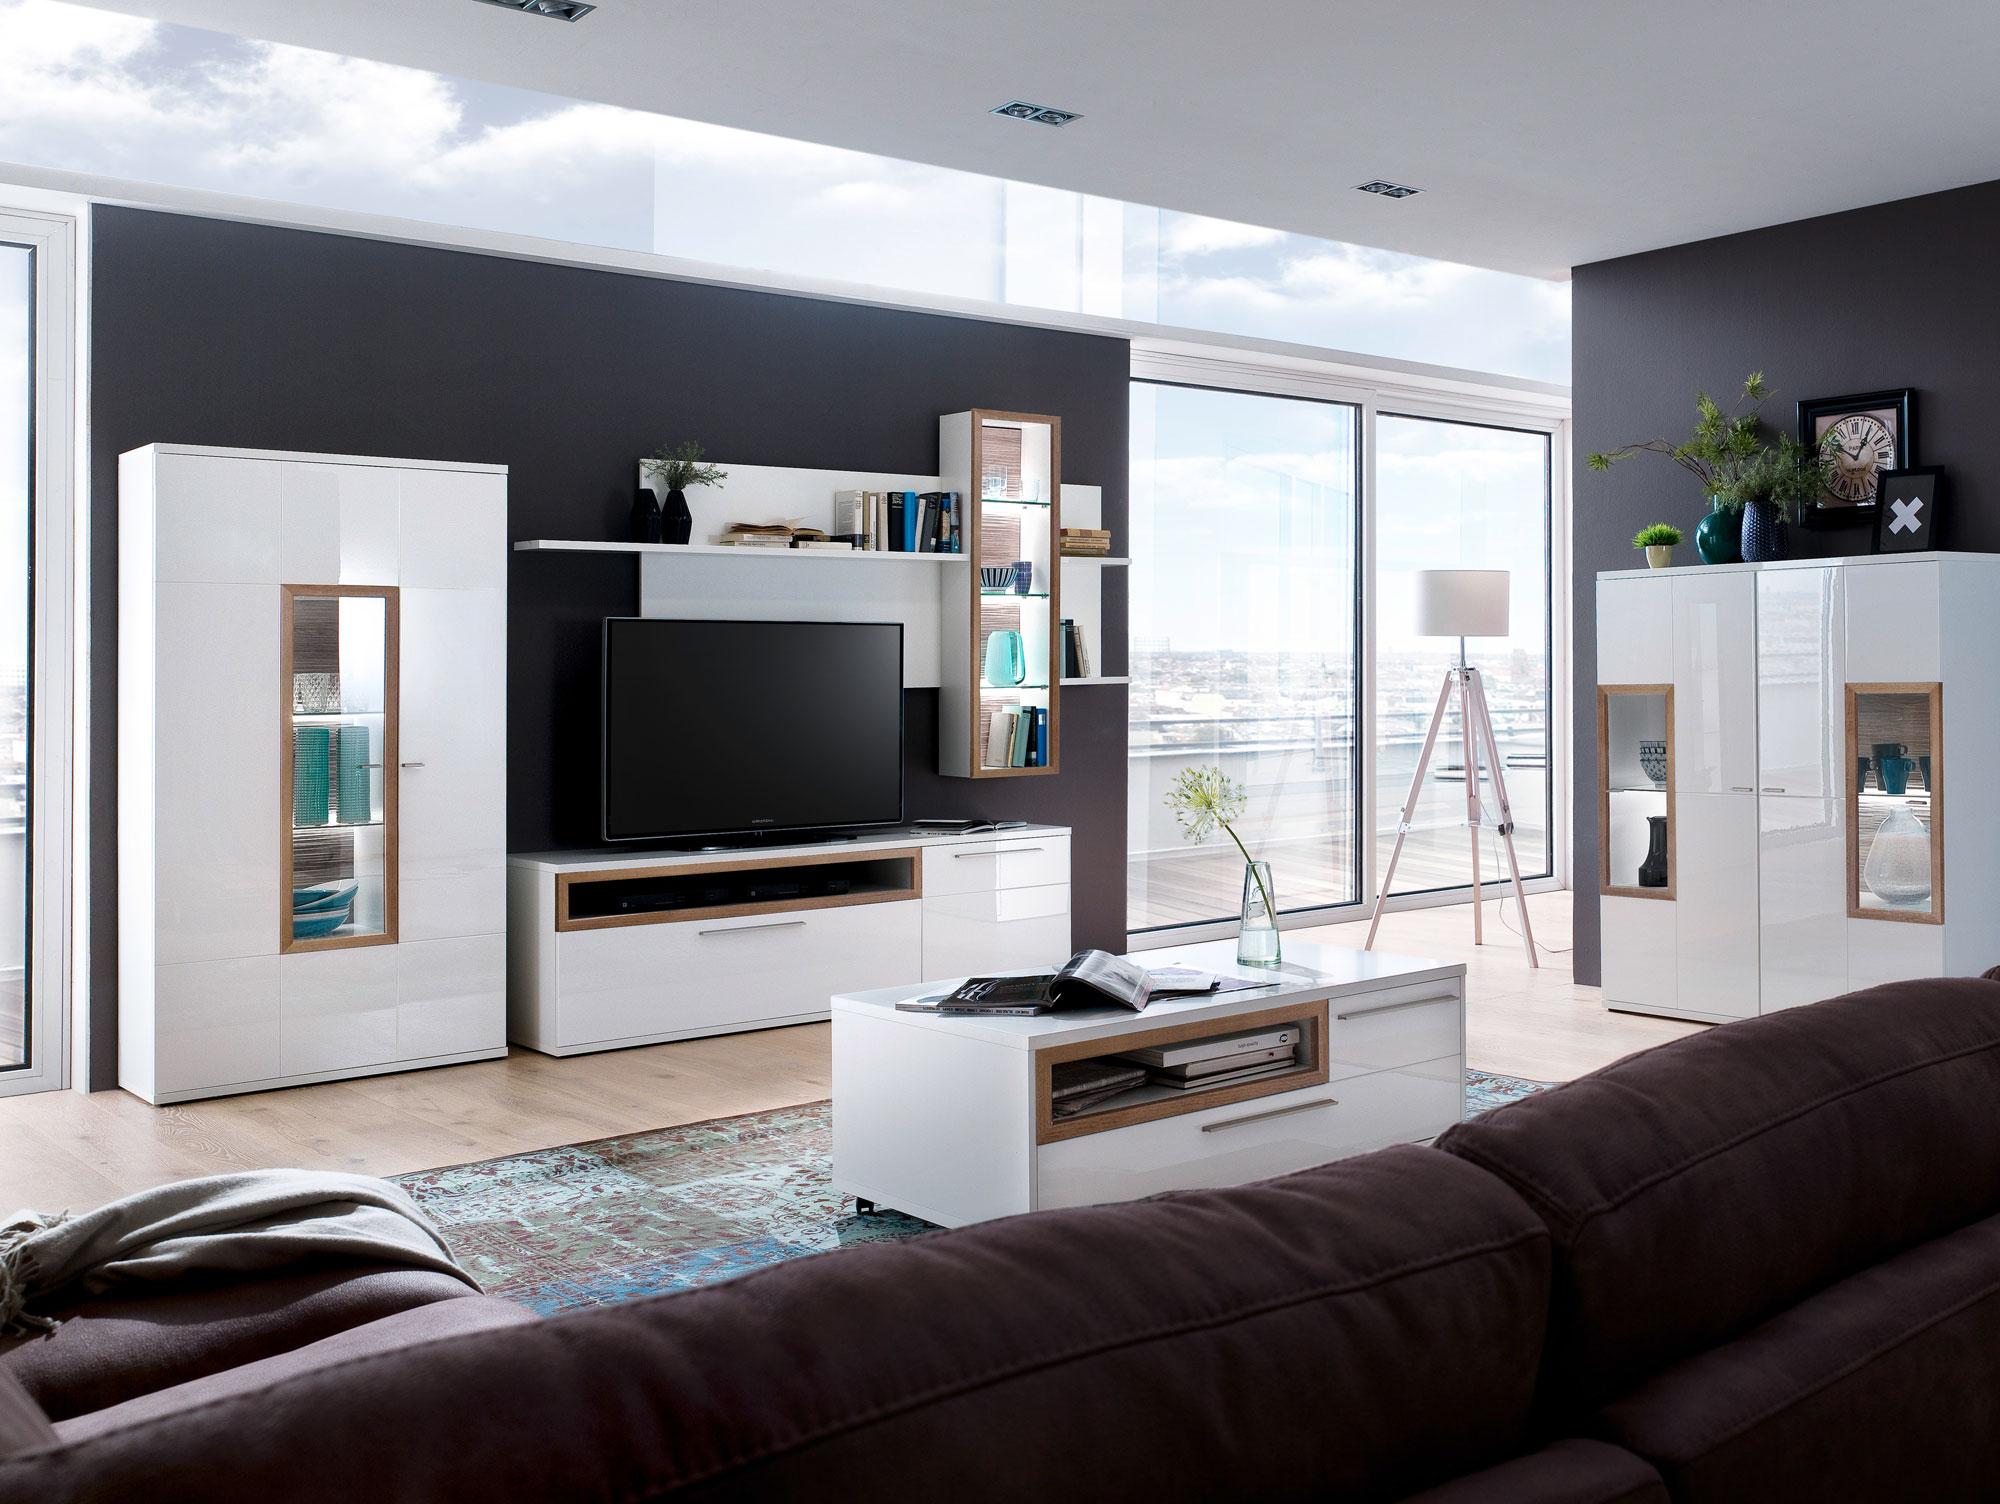 eck wohnwand wei excellent eck wohnwand ikea tv mbel ecklsung m ivholz quot c with eck wohnwand. Black Bedroom Furniture Sets. Home Design Ideas